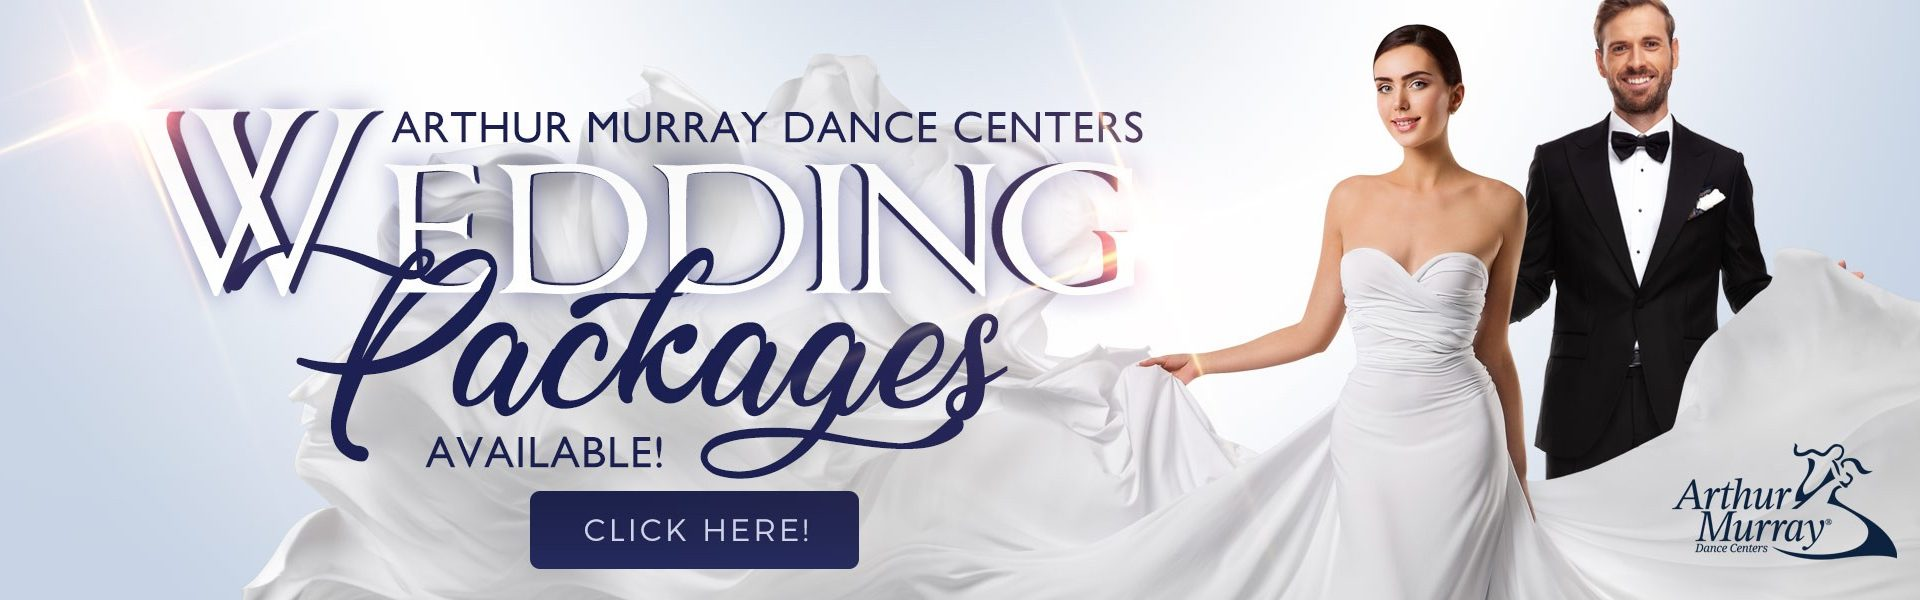 Arthur Murray Wedding Dance Packages